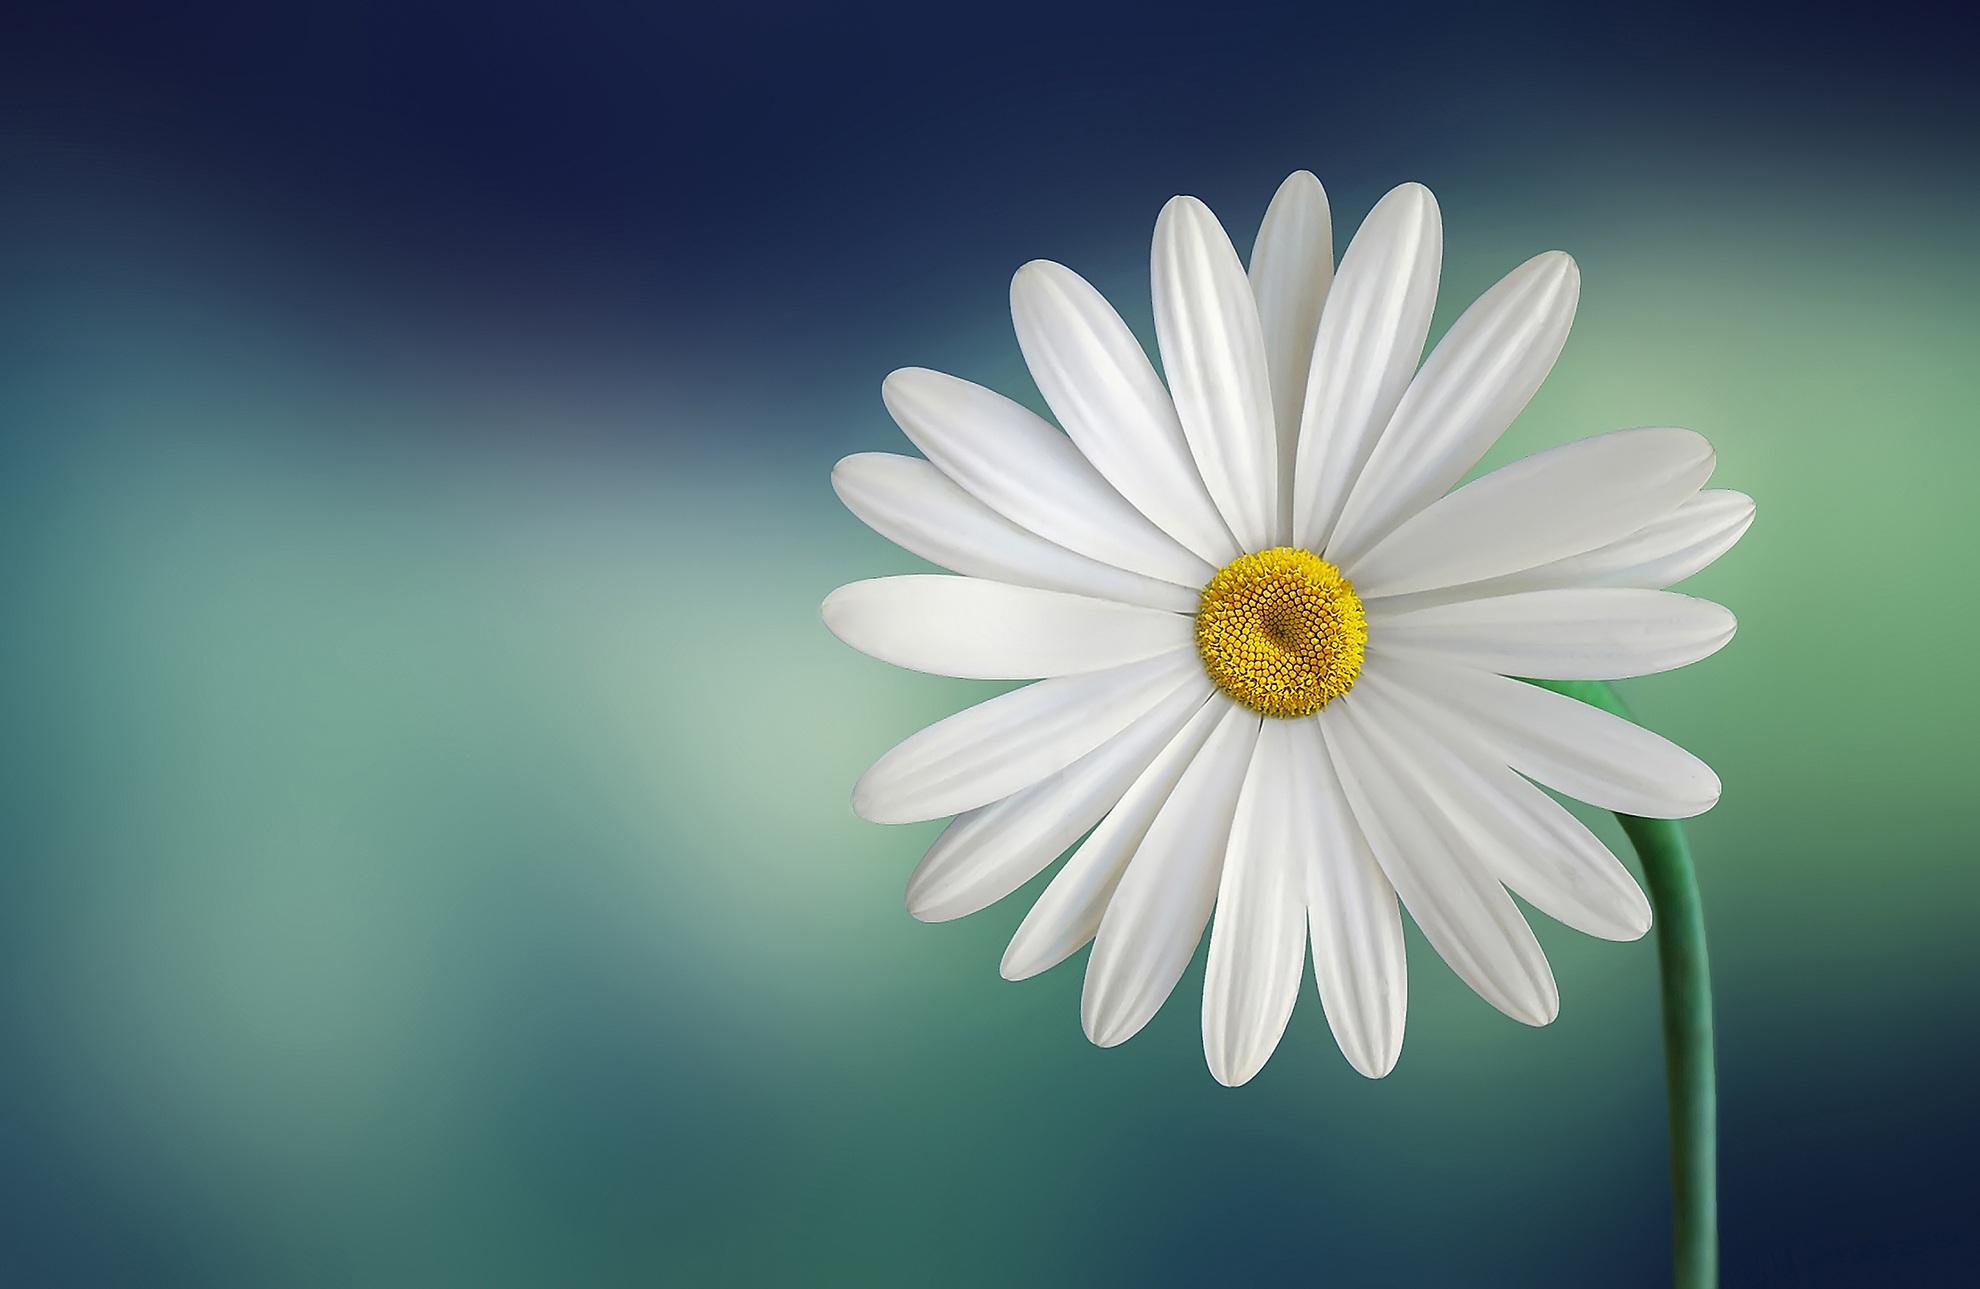 white daisy flower image